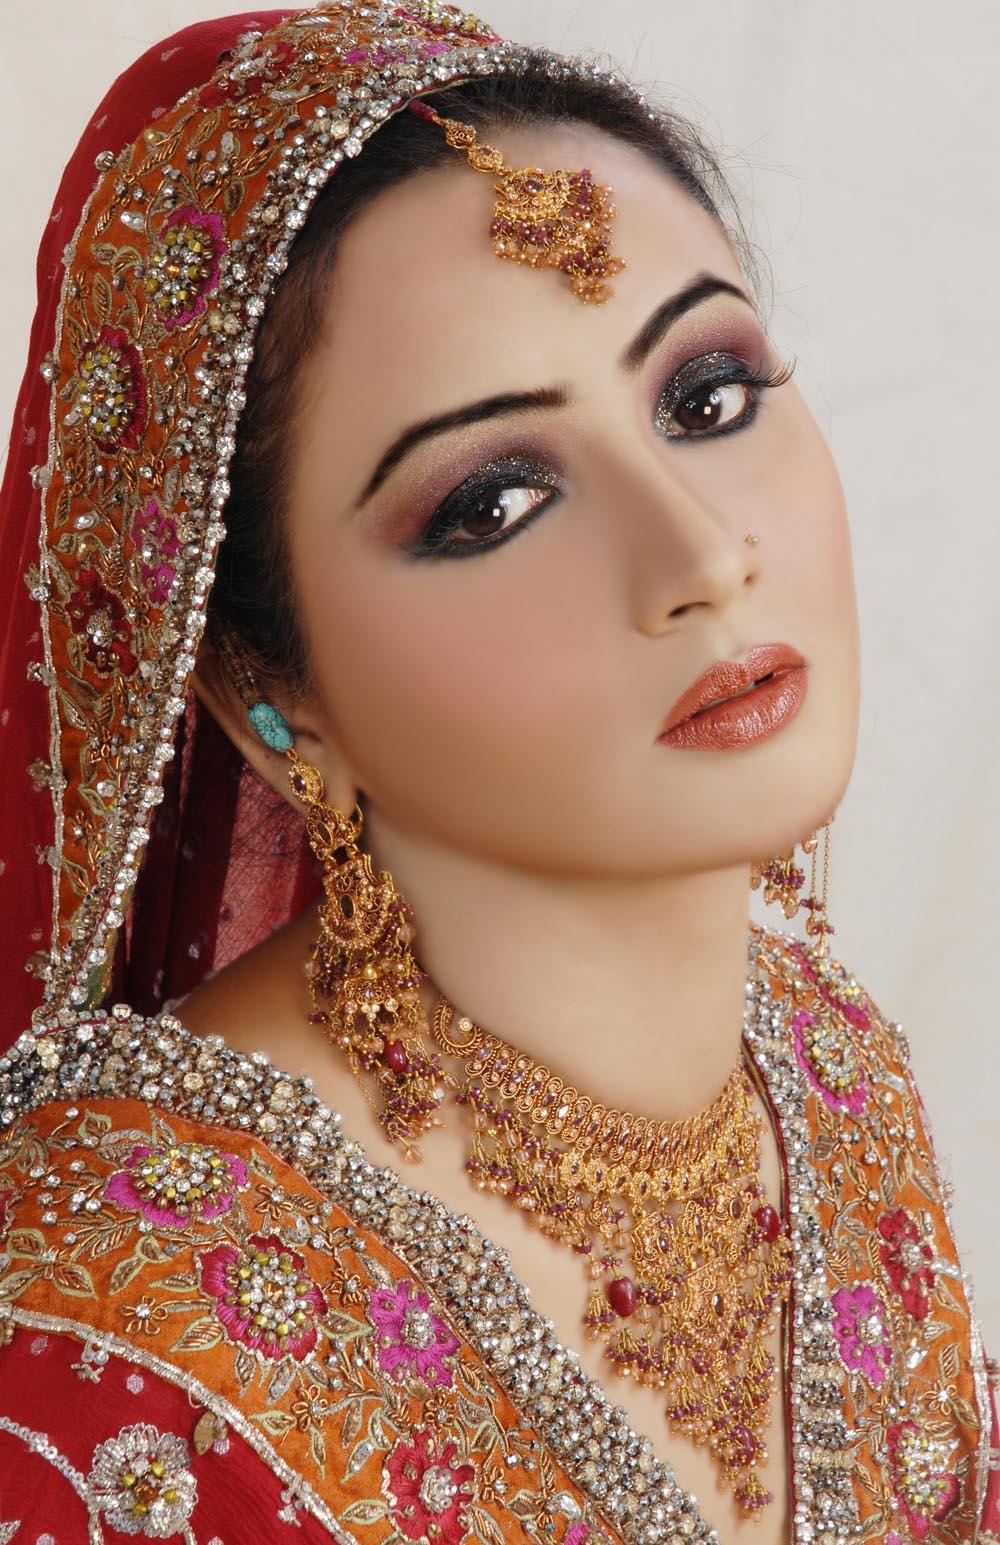 Bridal Makeup For Dark Skin: Bridal Makeup Tips For Brides On Their Wedding Day